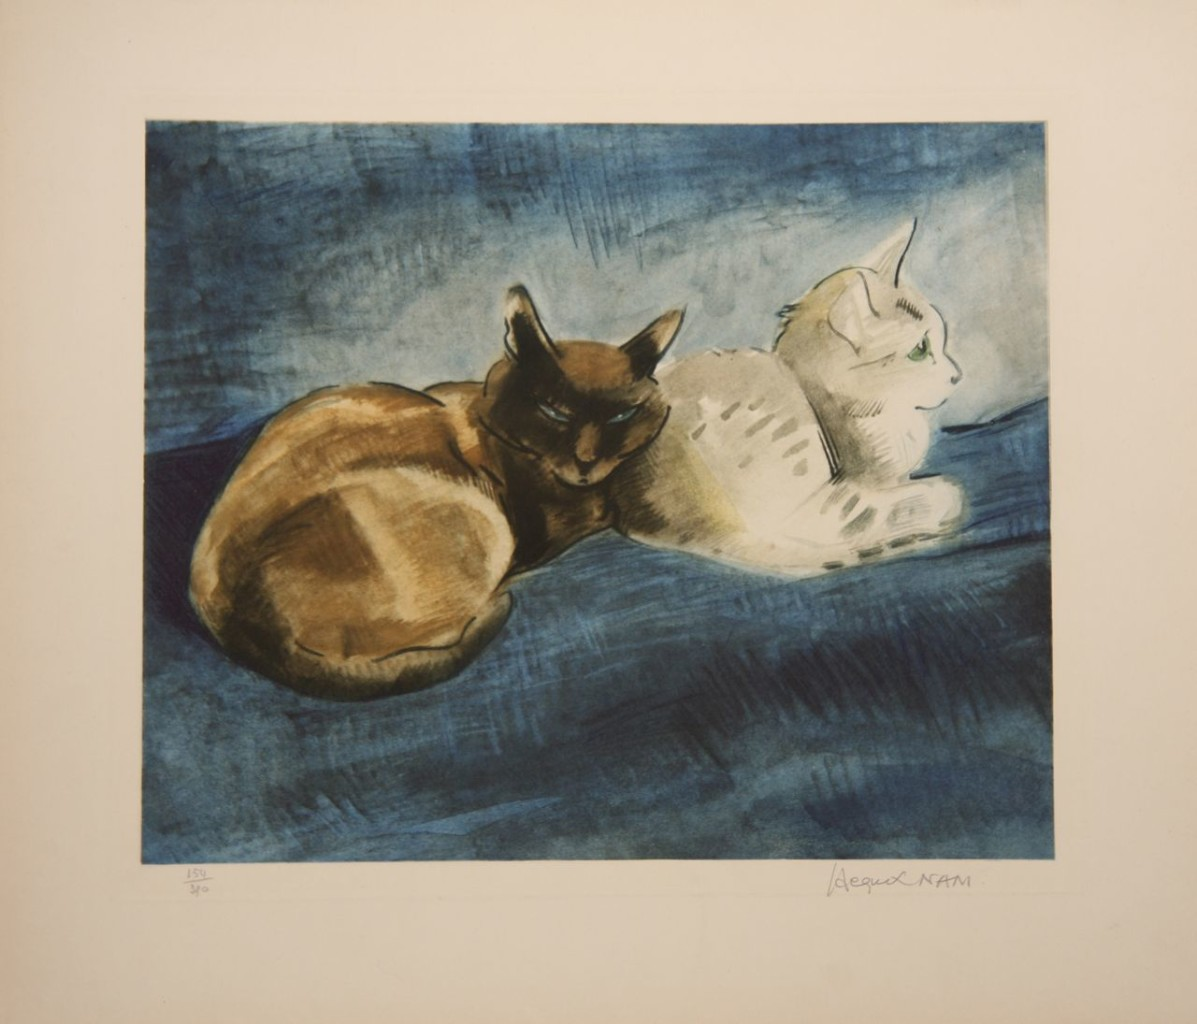 Capucin et Adimah 1950, Lehmann Nam